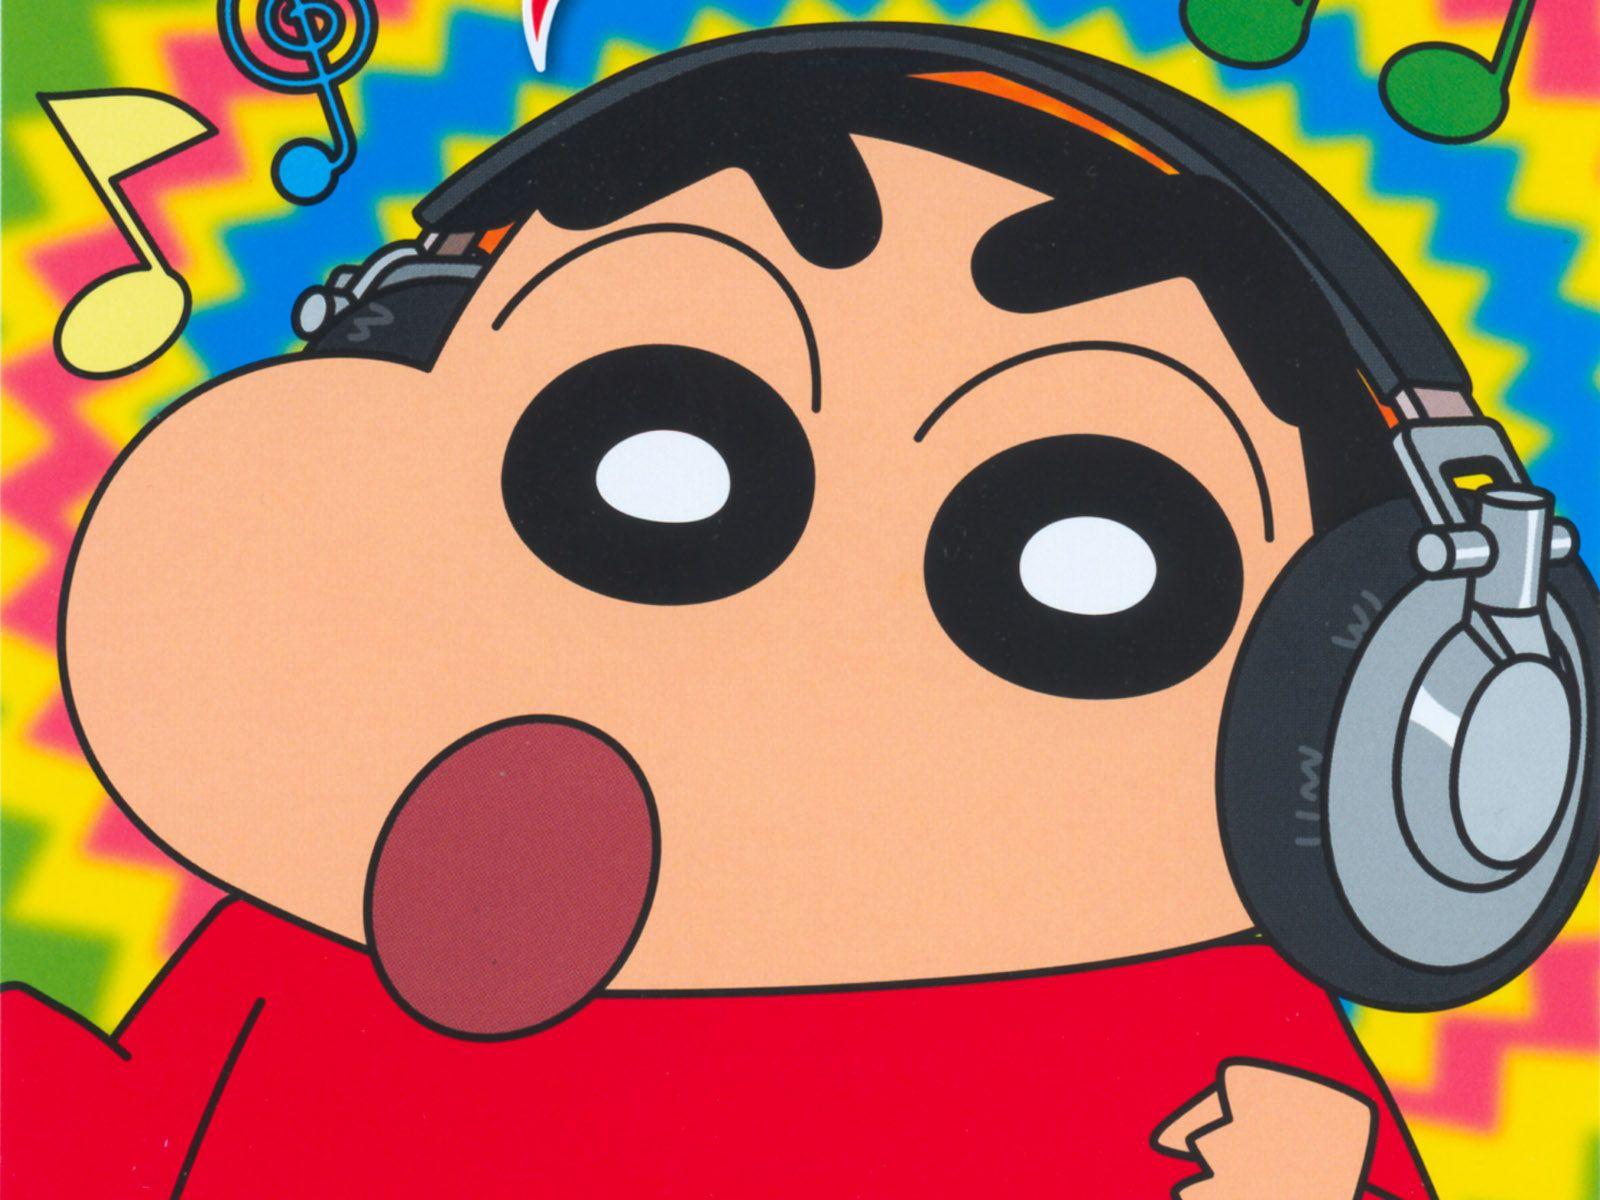 Crayon Shin Chan Wallpaper 1080p Anime And Cartoon Wallpapers Crayon Shin Chan Cute Cartoon Wallpapers Cartoon Wallpaper